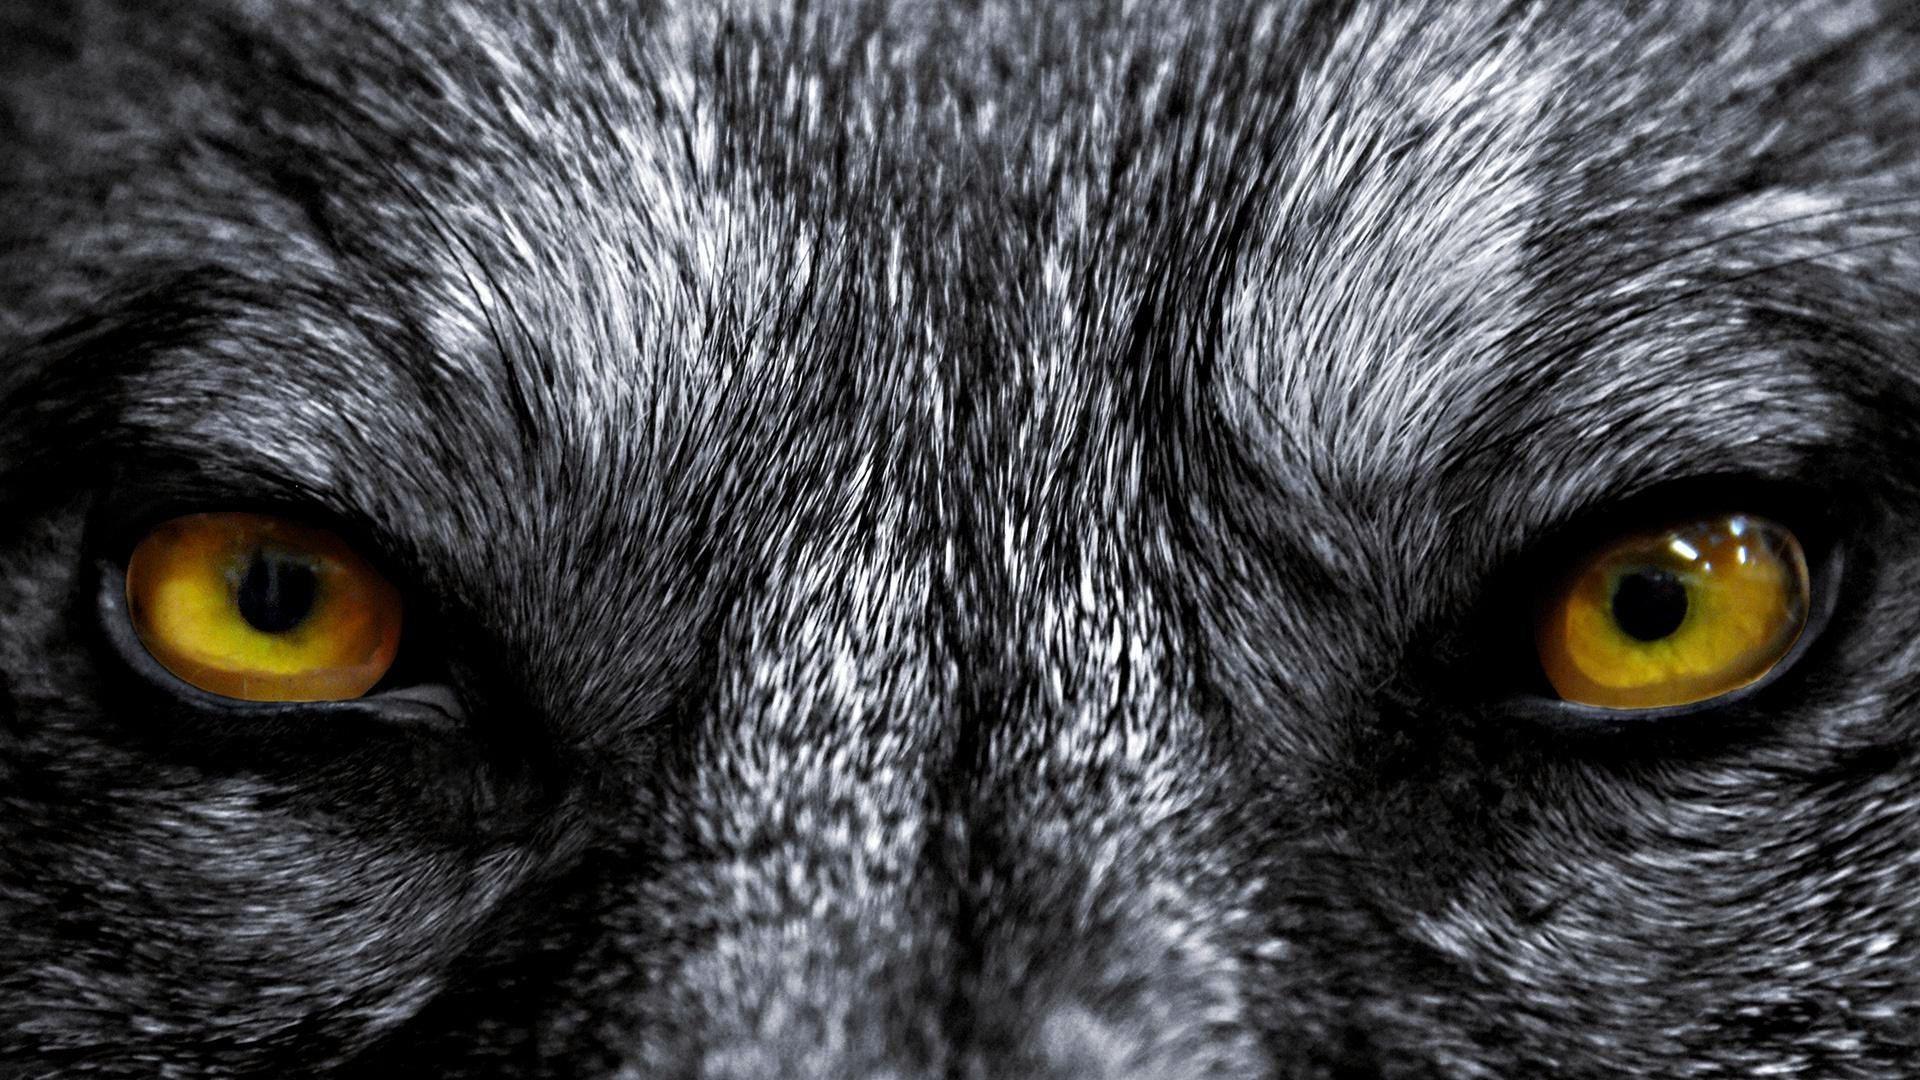 Wolf Eyes Live Wallpaper